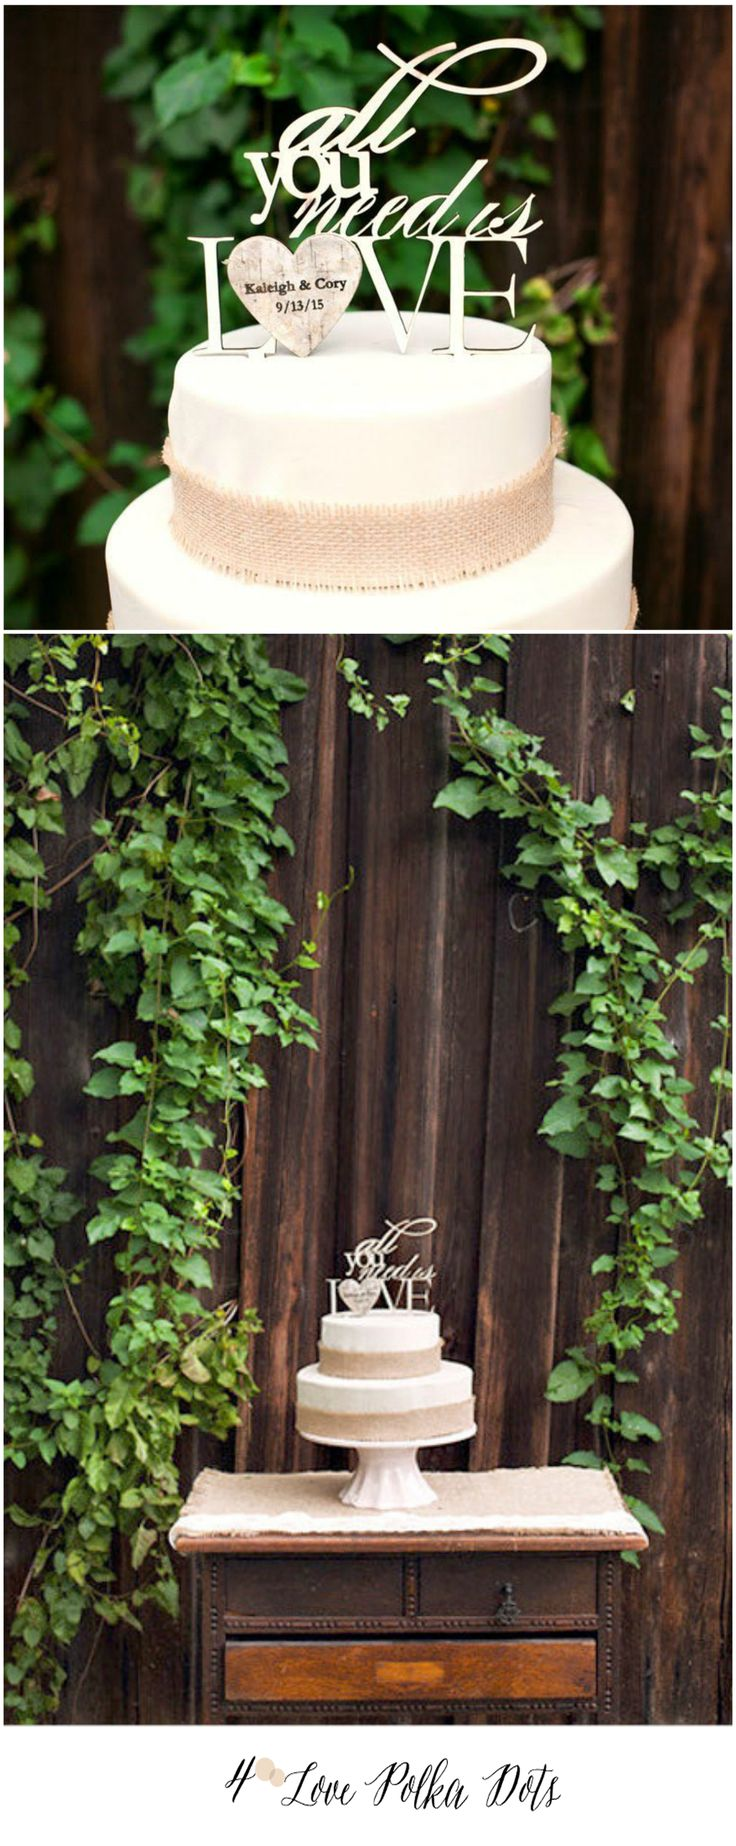 All you need is love ! Wooden Wedding Cake Topper #wood #wooden #weddingcaketopper #custom #green #greenery #weddingideas #rusticwedding